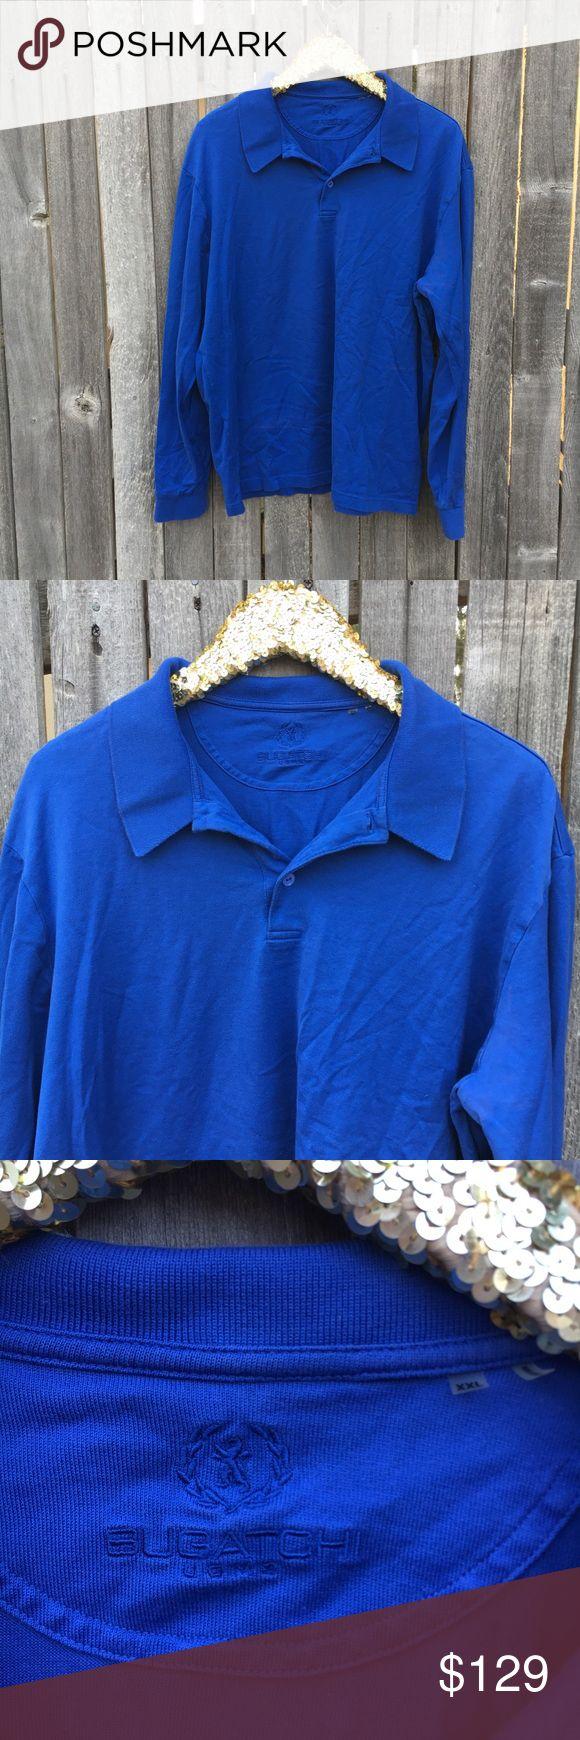 Bugatchi Blue Long Sleeve Polo Shirt XXL EUC! Barely worn! Royal Blue long Sleeve Polo or Rugby Style Shirt. Classic American style. Measurements coming ASAP! Bugatchi Shirts Polos